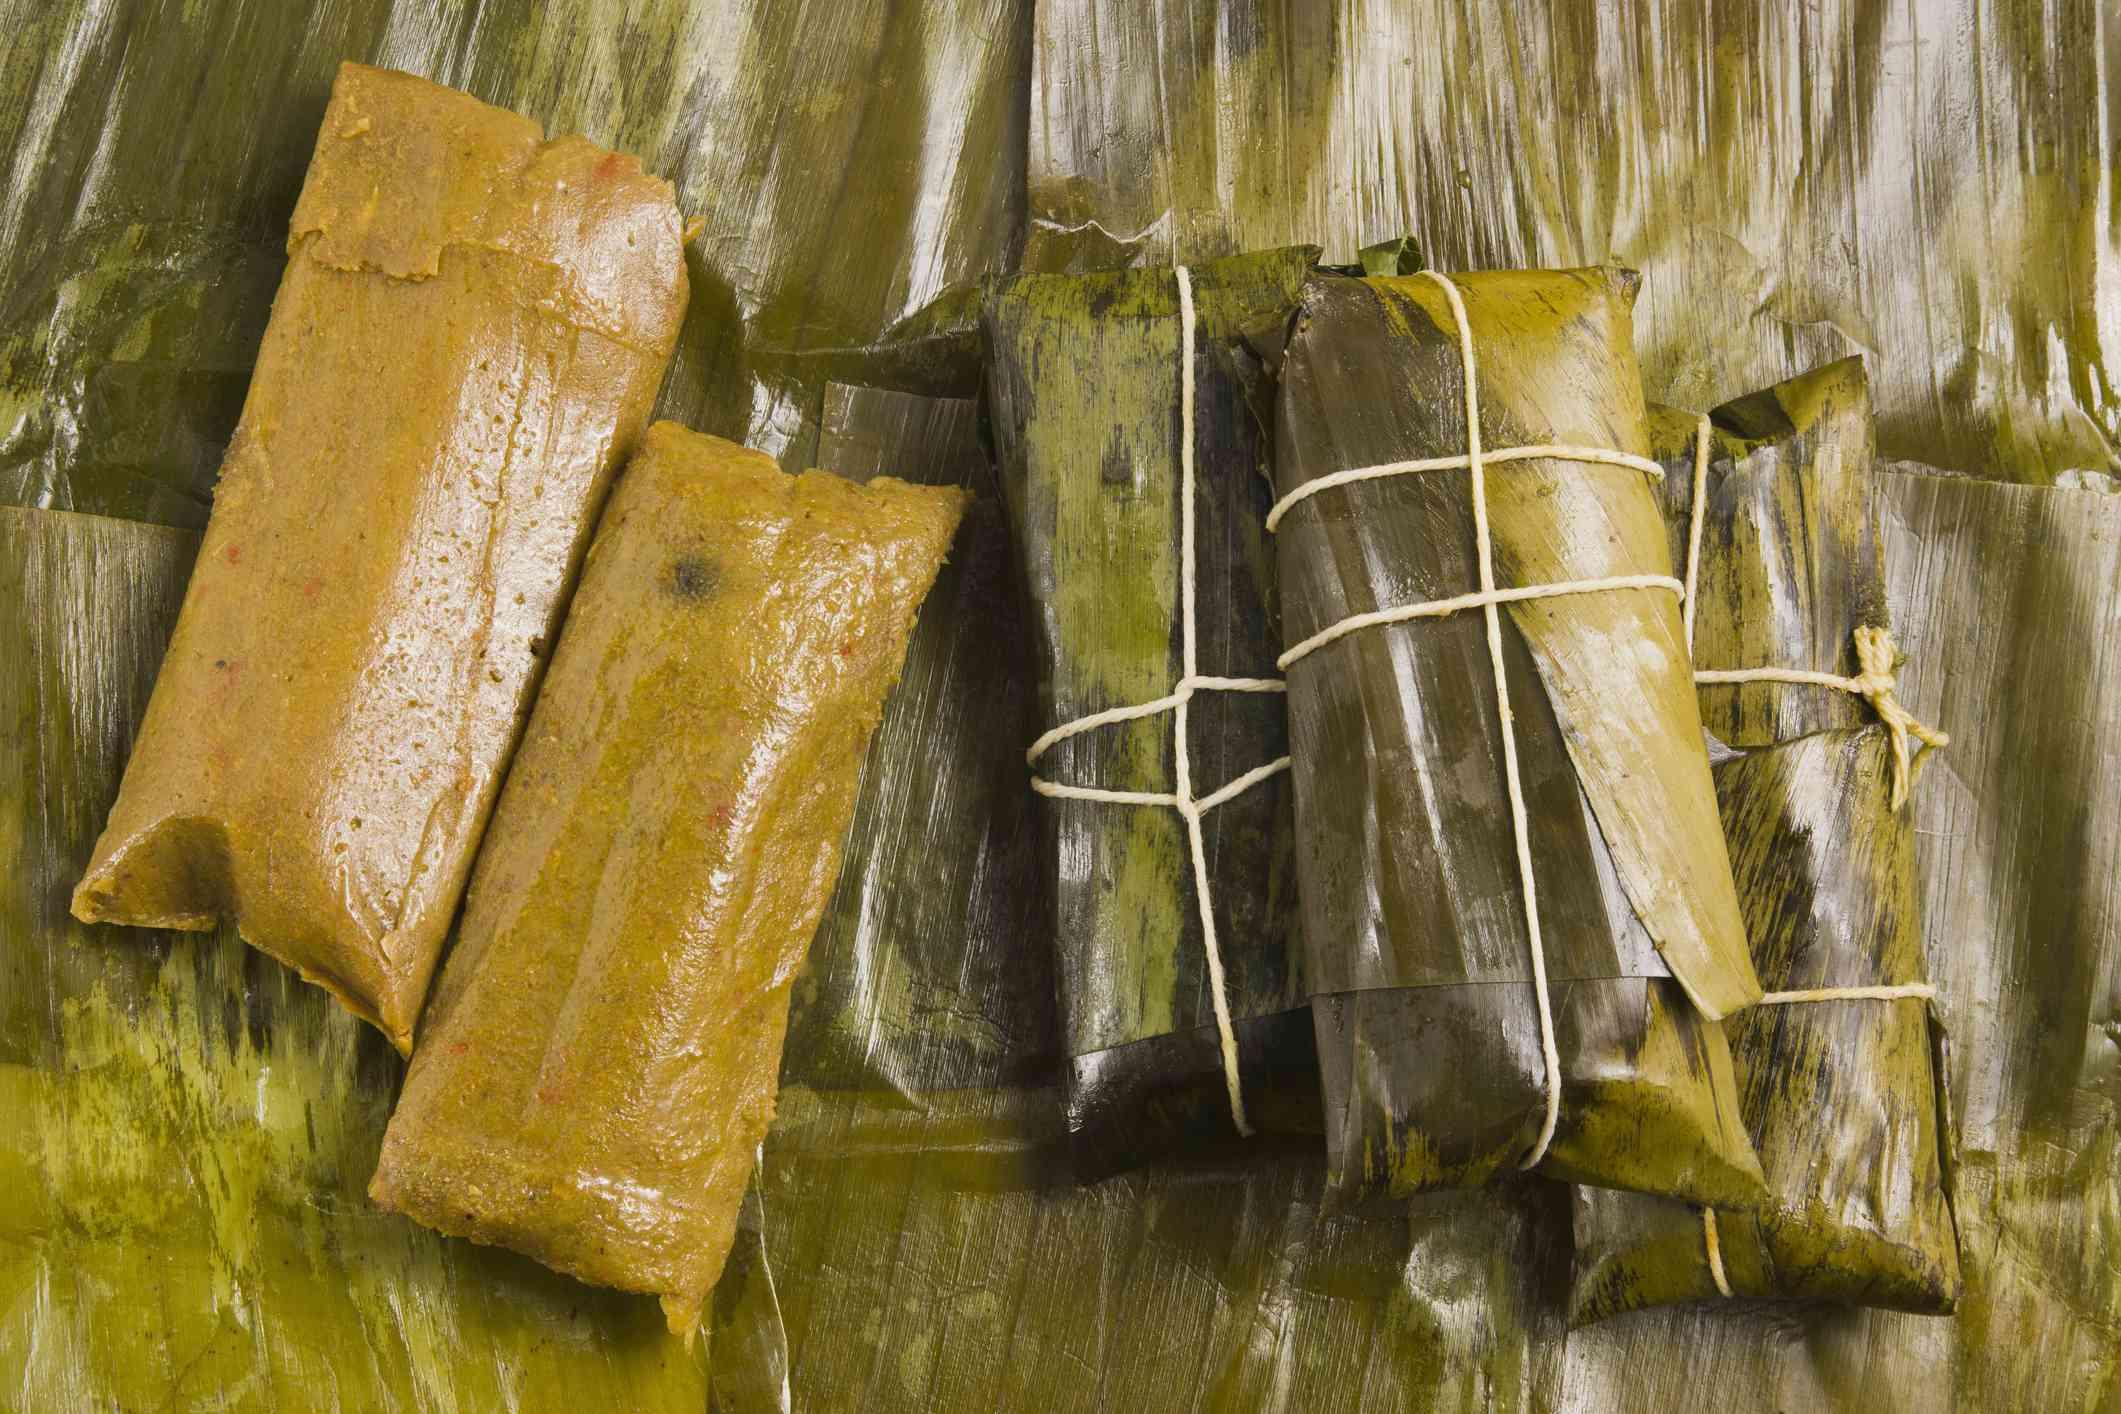 Pasteles en Hoja from Dominican Republic